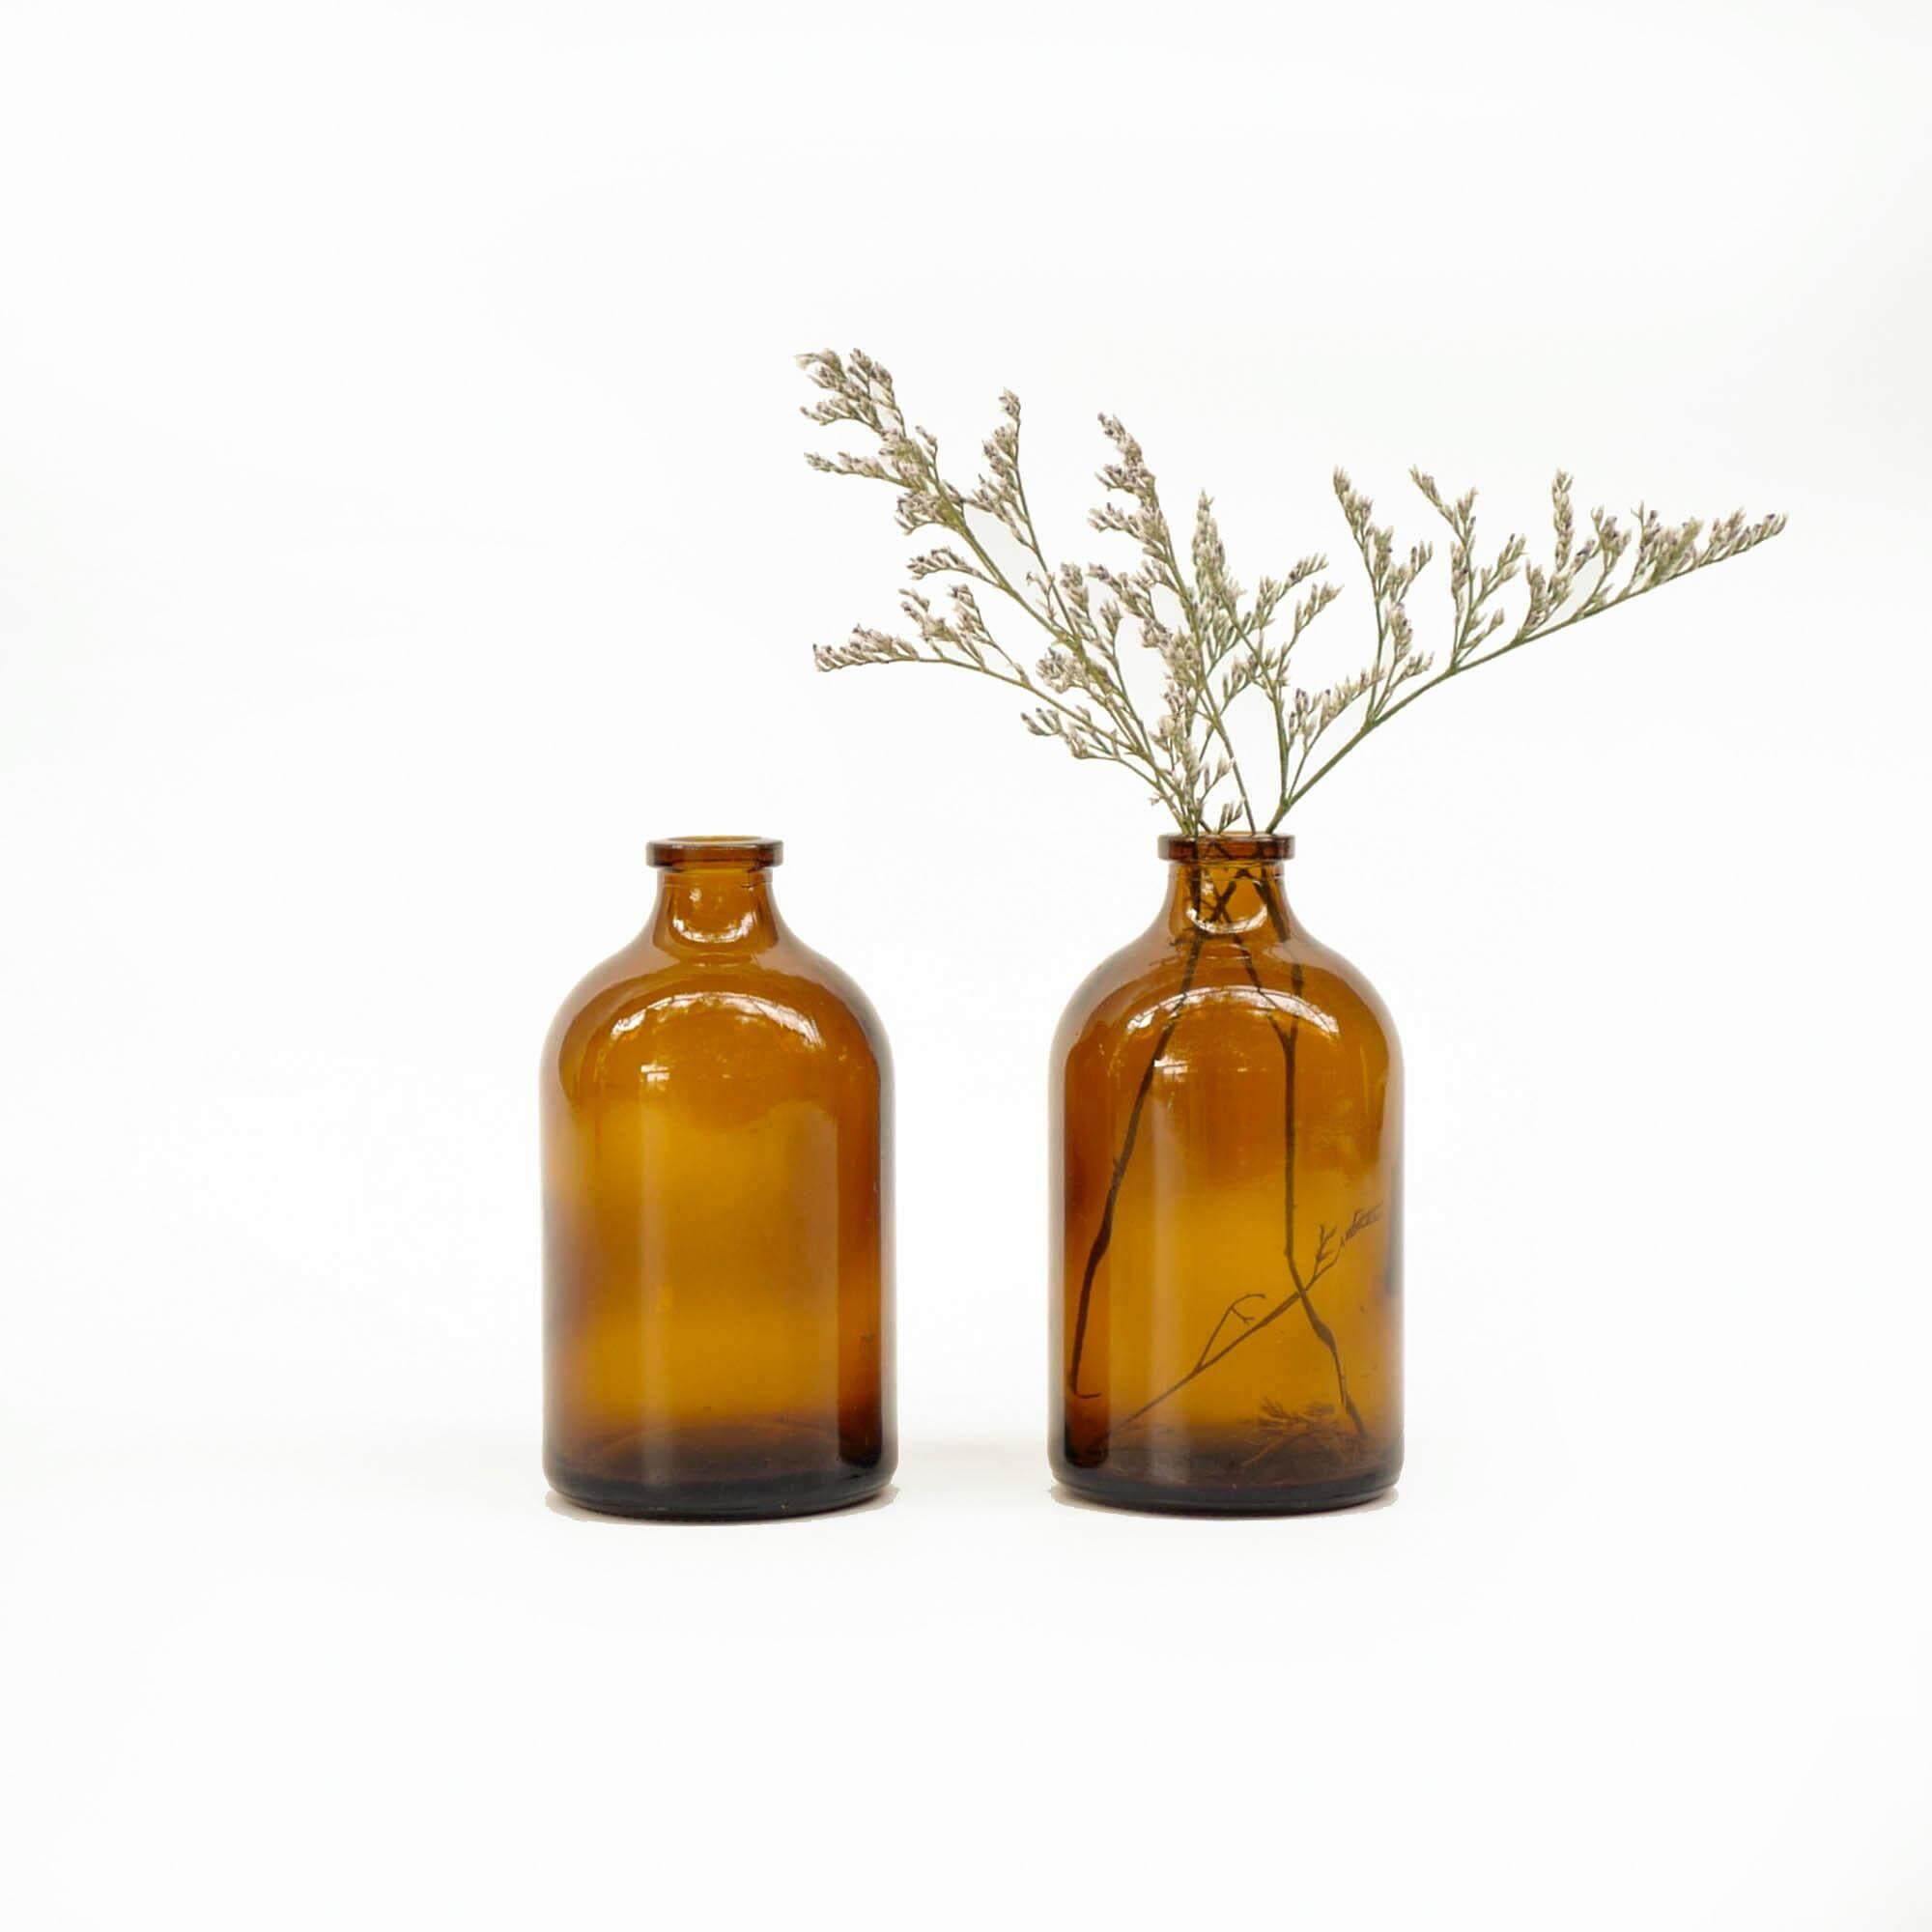 Homequarterbkk-Chubby Brown Glass Bottle 100ml+caspia สีน้ำตาล สีชา ทรงอ้วนกลม ขวด แก้ว แจกัน ที่ใส่ ดอกไม้ ตกแต่ง .